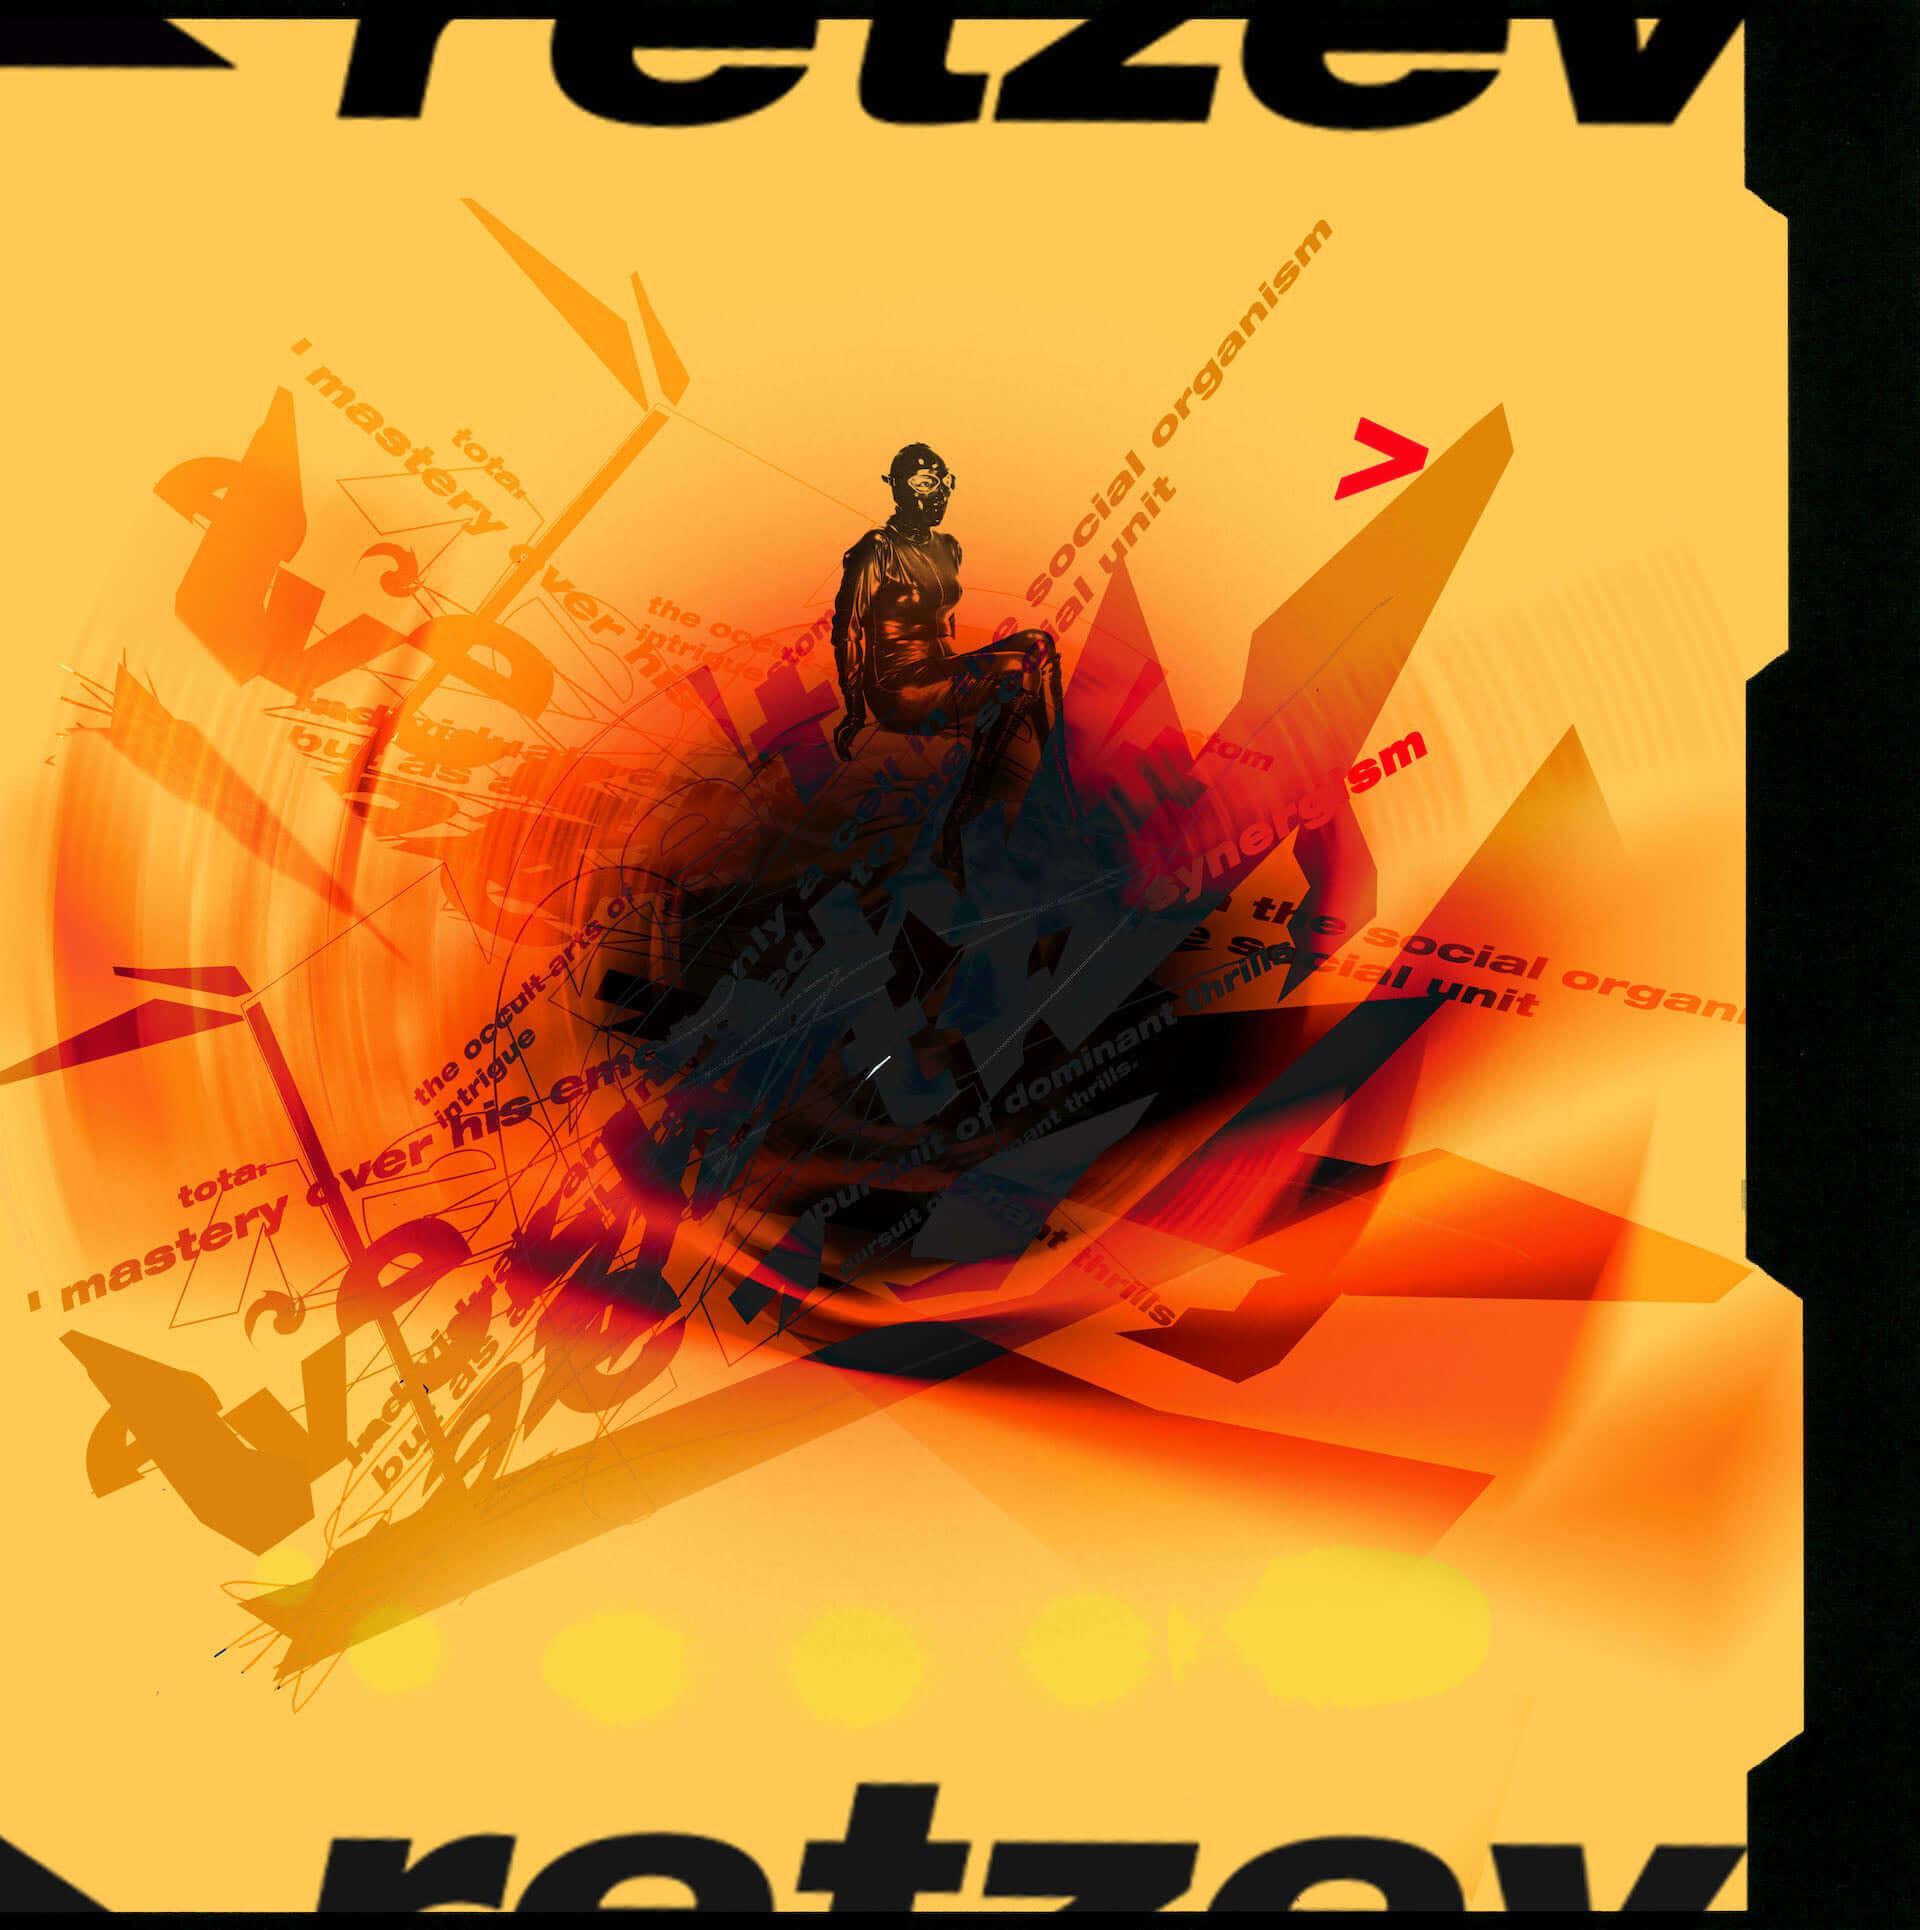 tokyovitaminのDISK NAGATAKIが初のオリジナルEPを発表| 『retzev』『FIELDKUTTER』2枚同時リリース! music-disknagataki-2-1920x1930